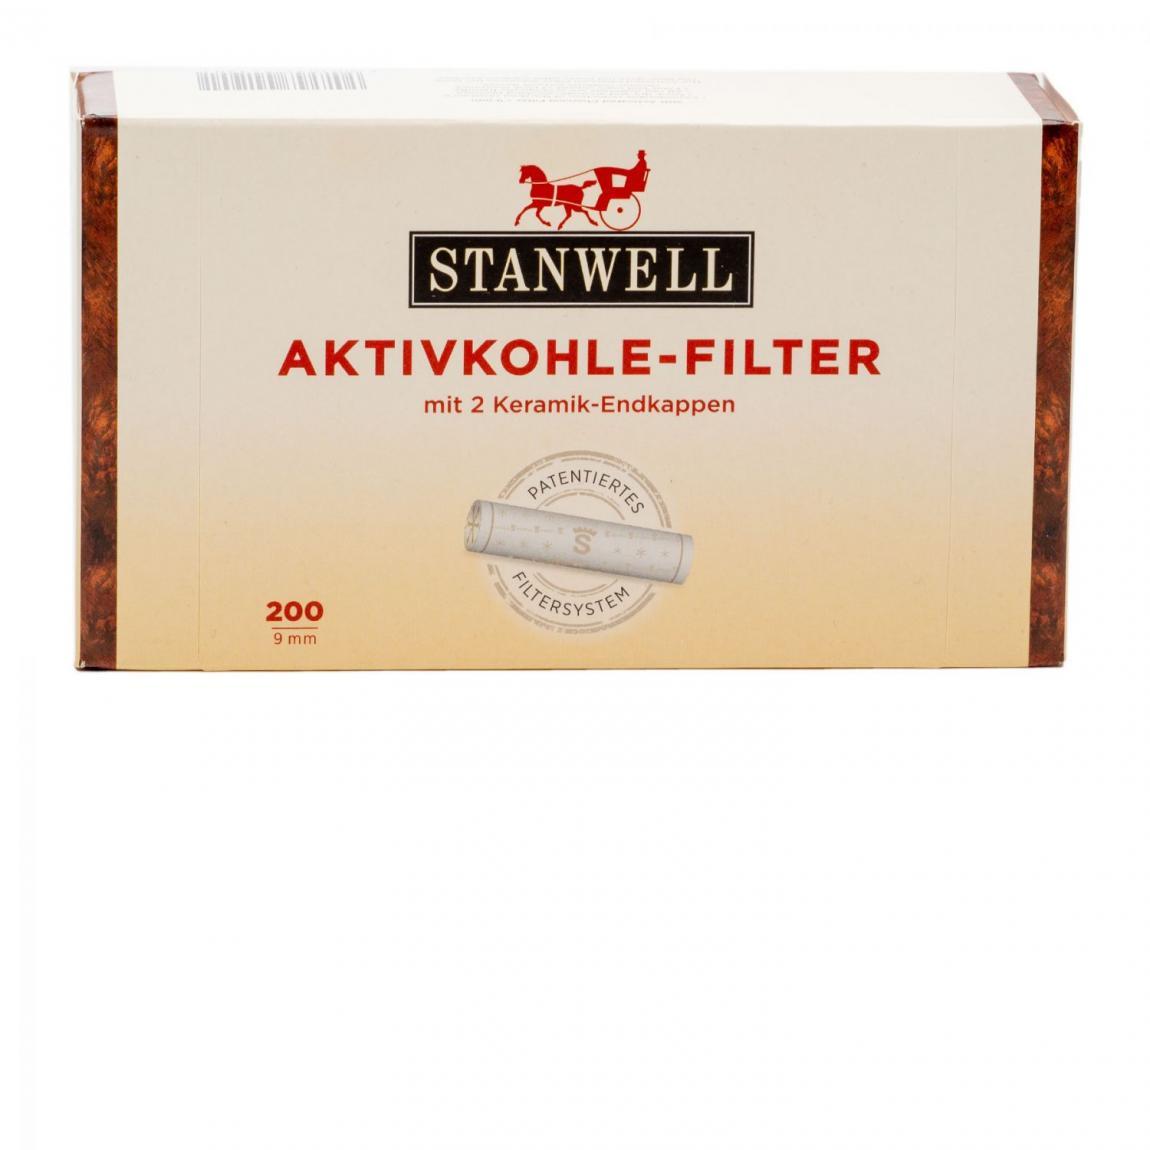 Stanwell Aktivkohle-Filter 9mm 1x200 Stück